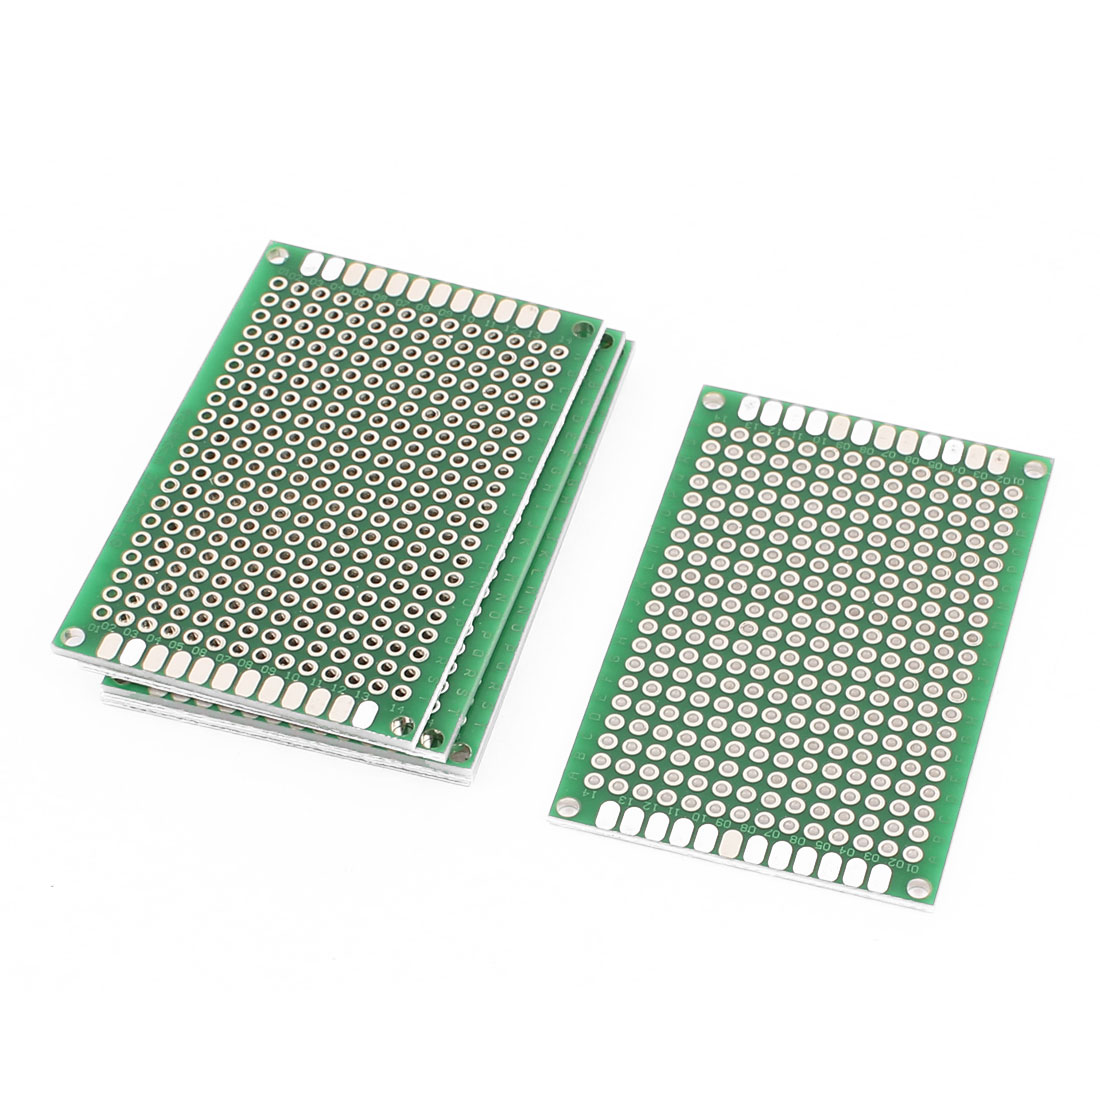 6Pcs Double-Side Prototype Solderable Paper Universal PCB Board 4x6cm